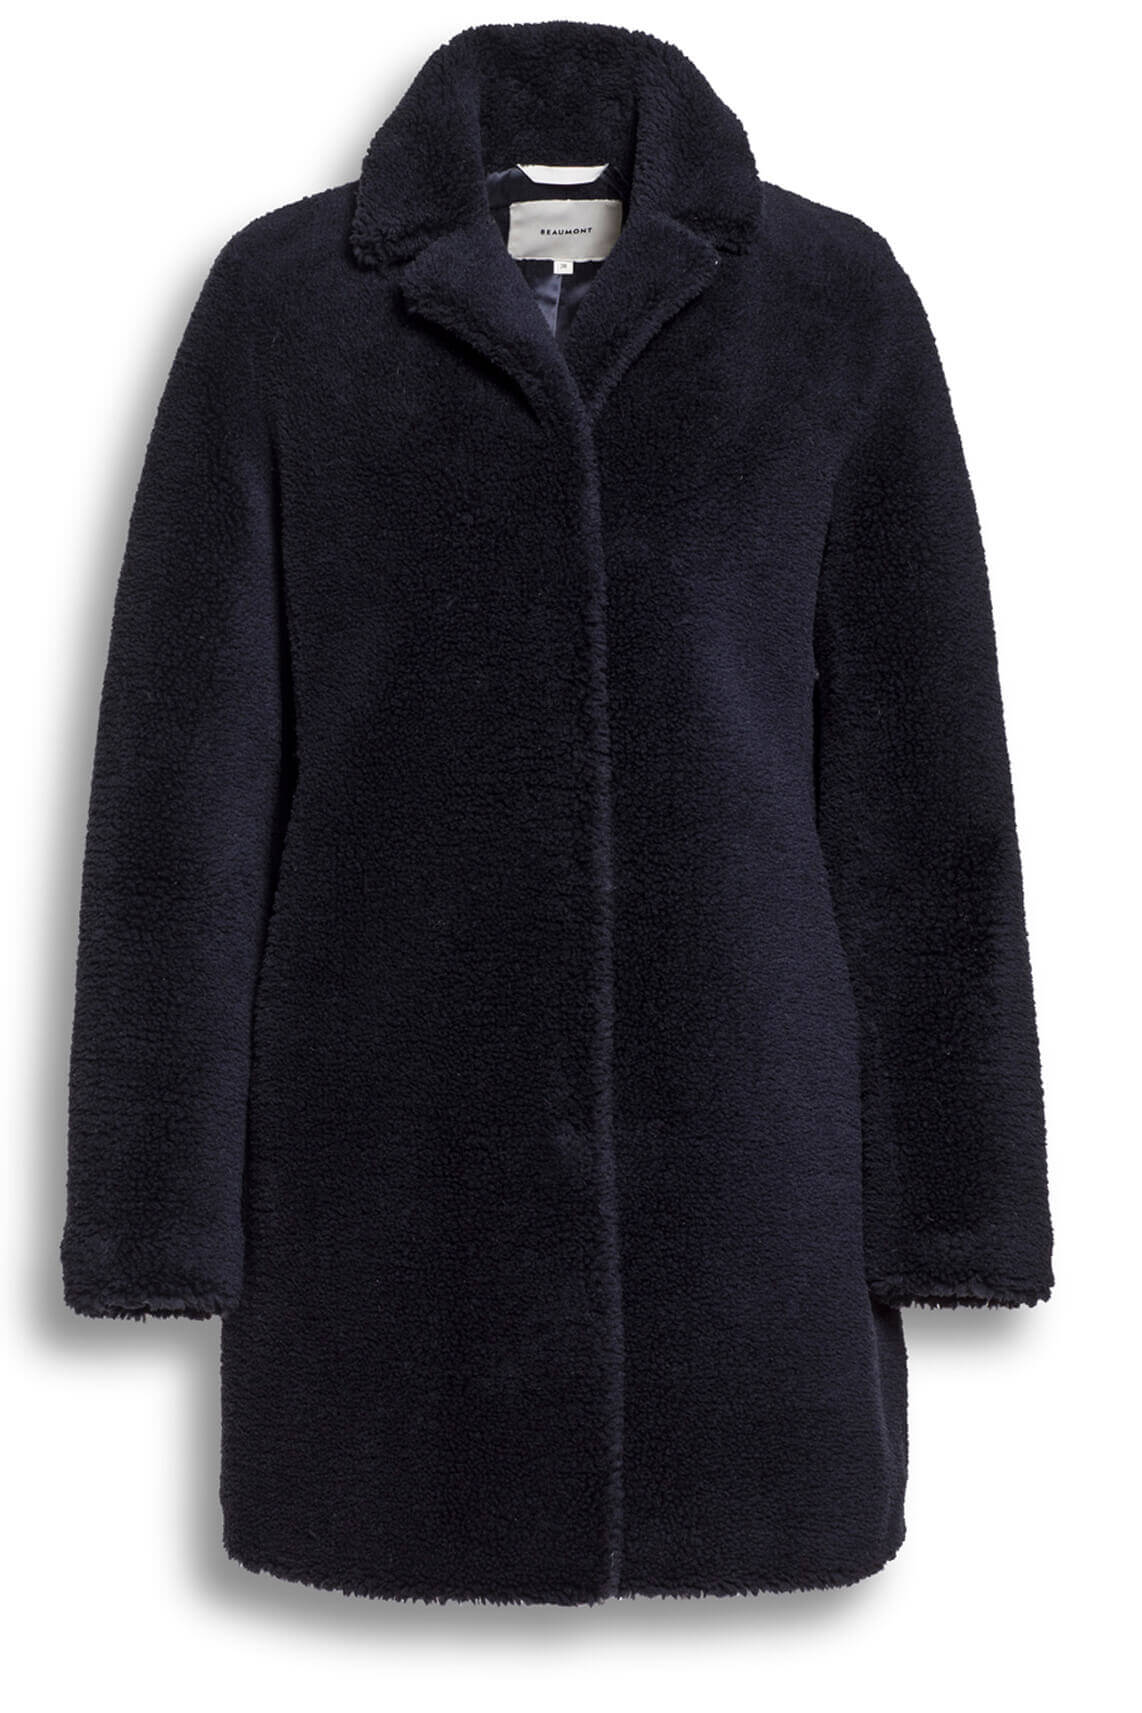 Beaumont Dames Teddy mantel Blauw